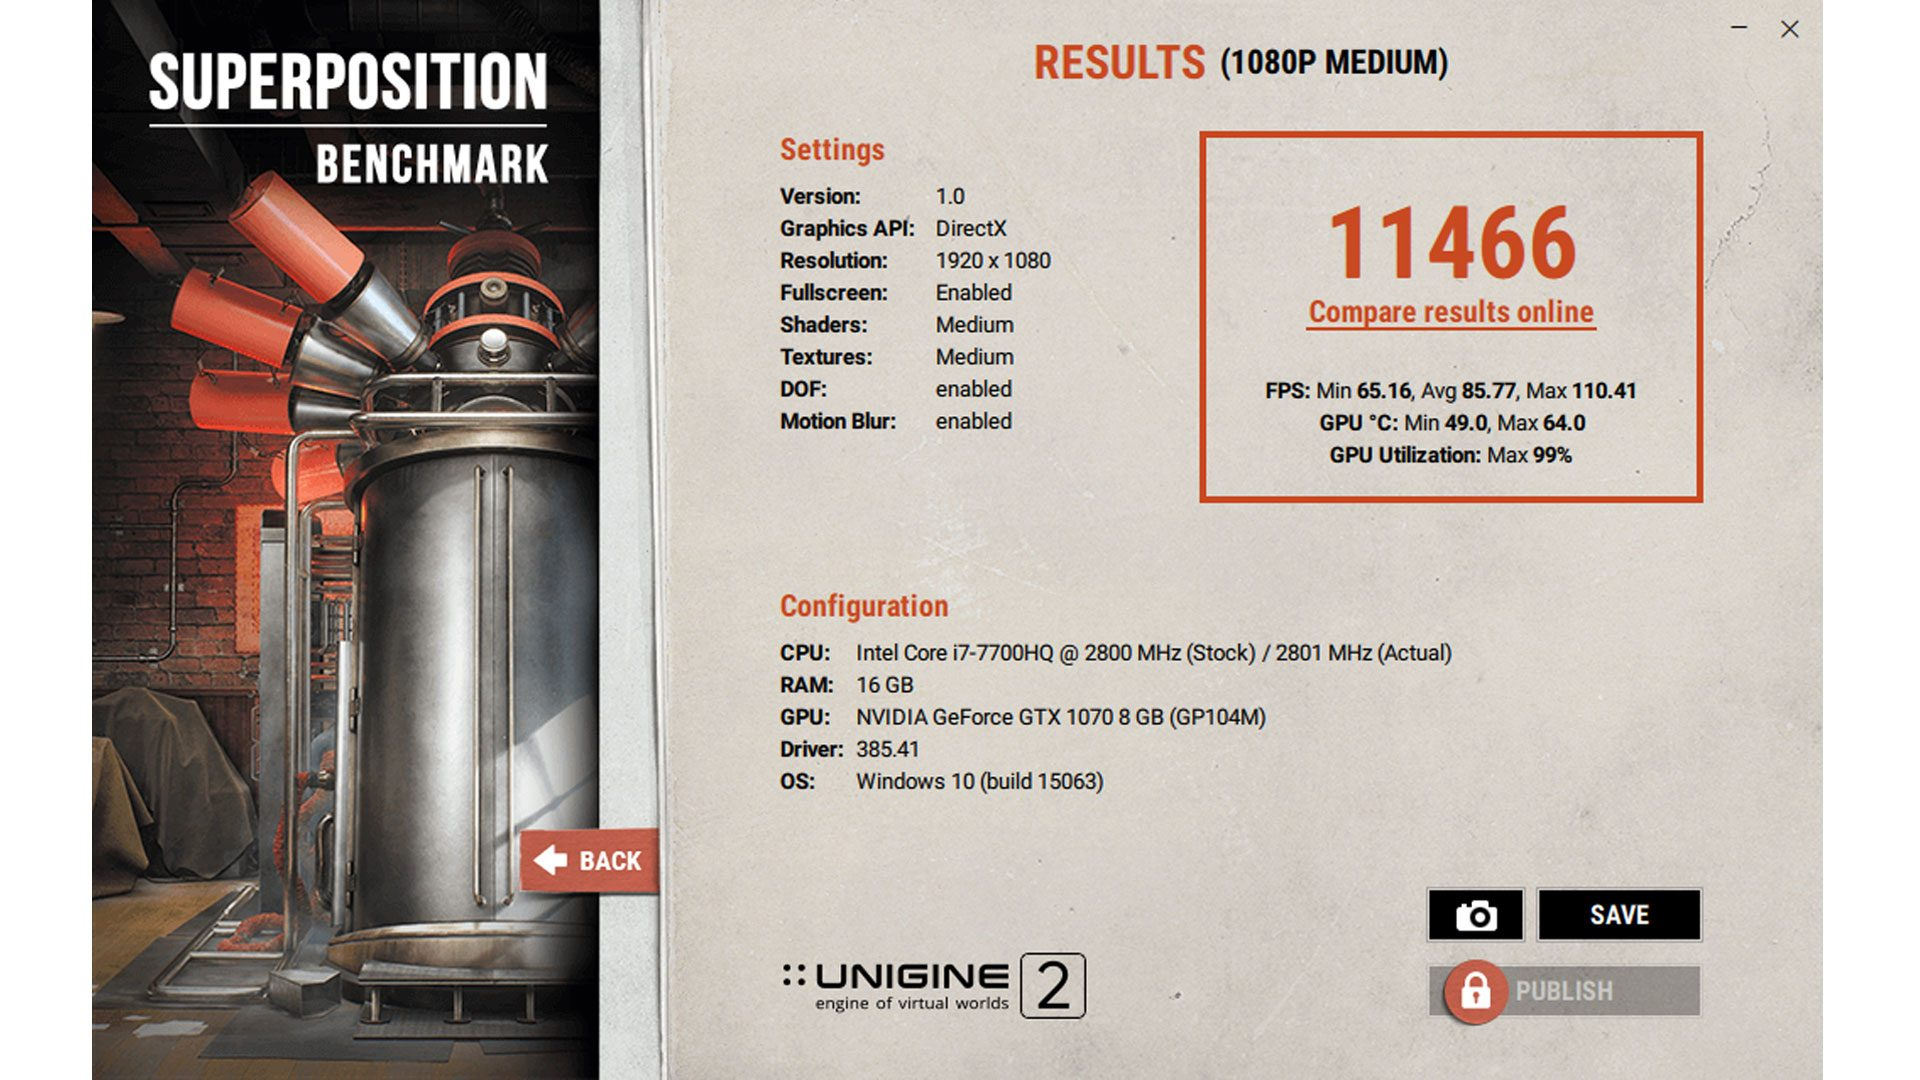 Acer-Predator-17-G9-793-718-Grafik-10